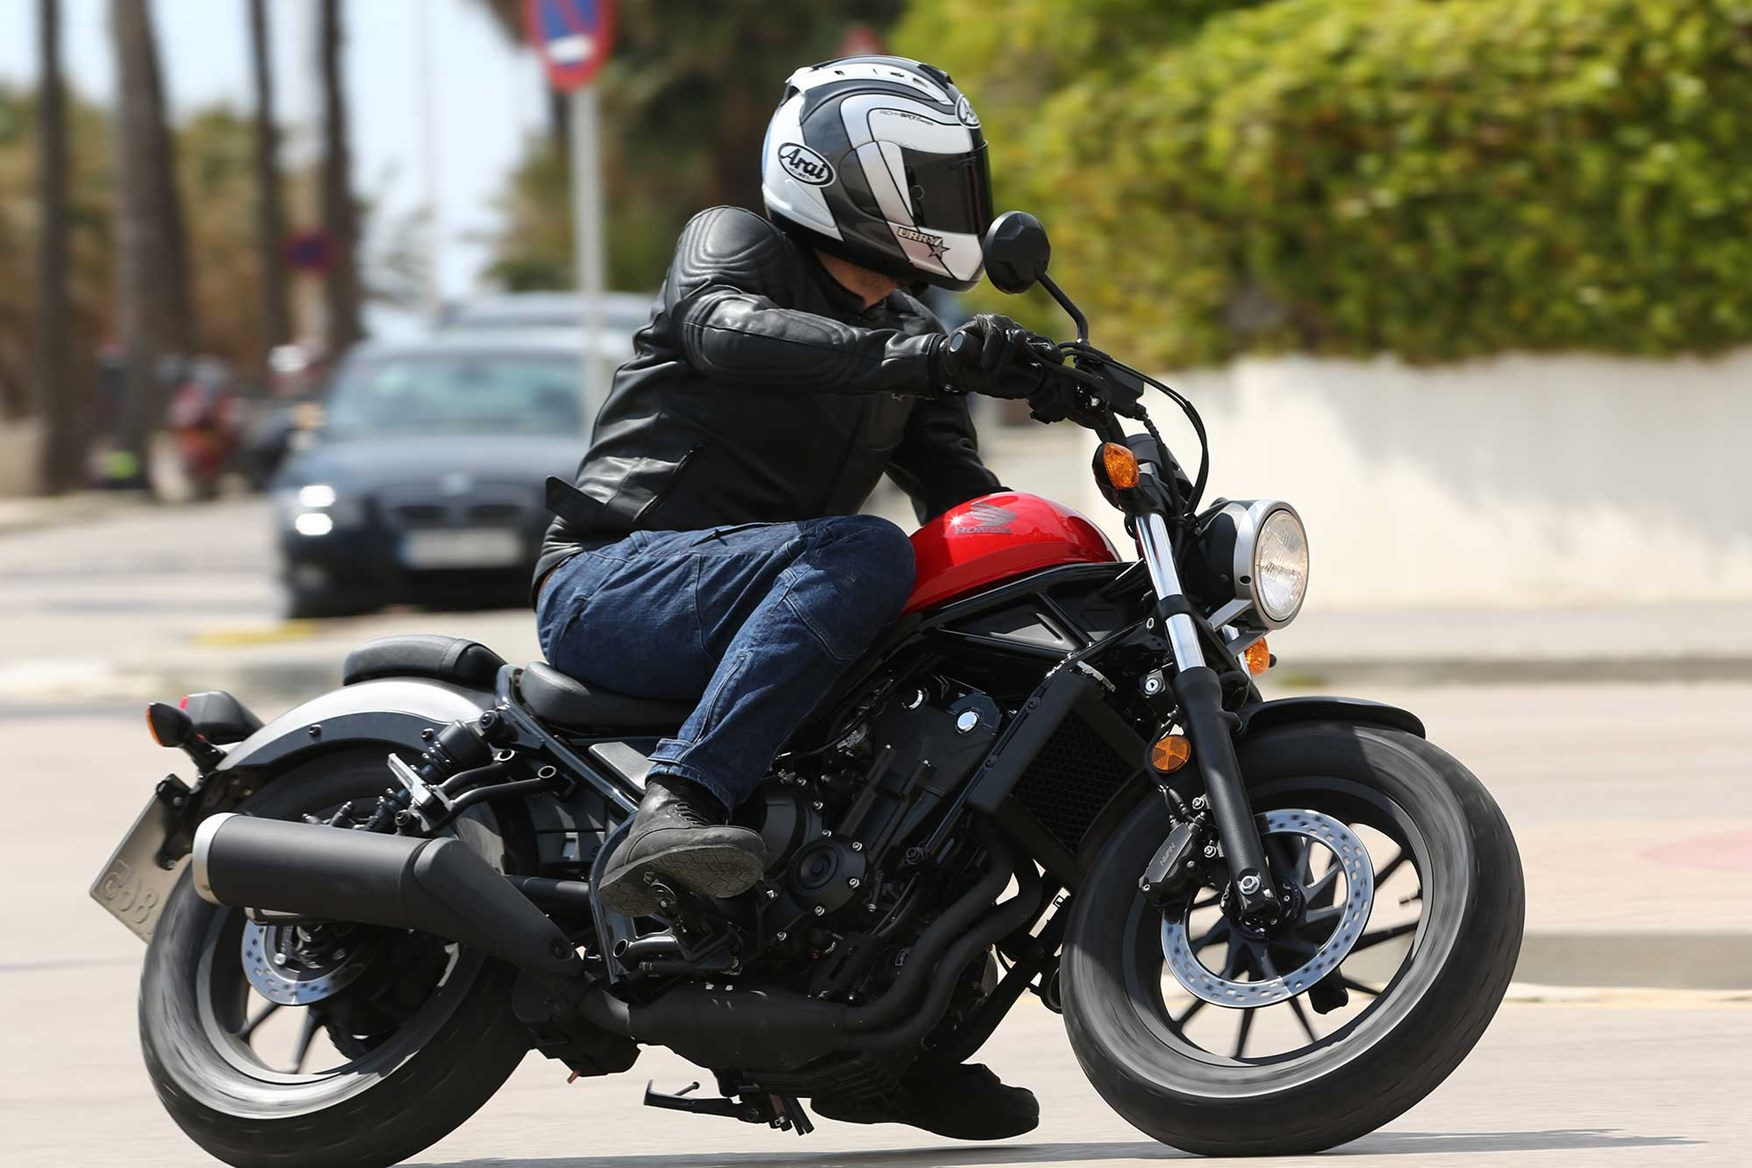 Hondas Cmx500 Rebel Is An Absolute Scream To Ride Mcn White Honda Bobber Advertisement